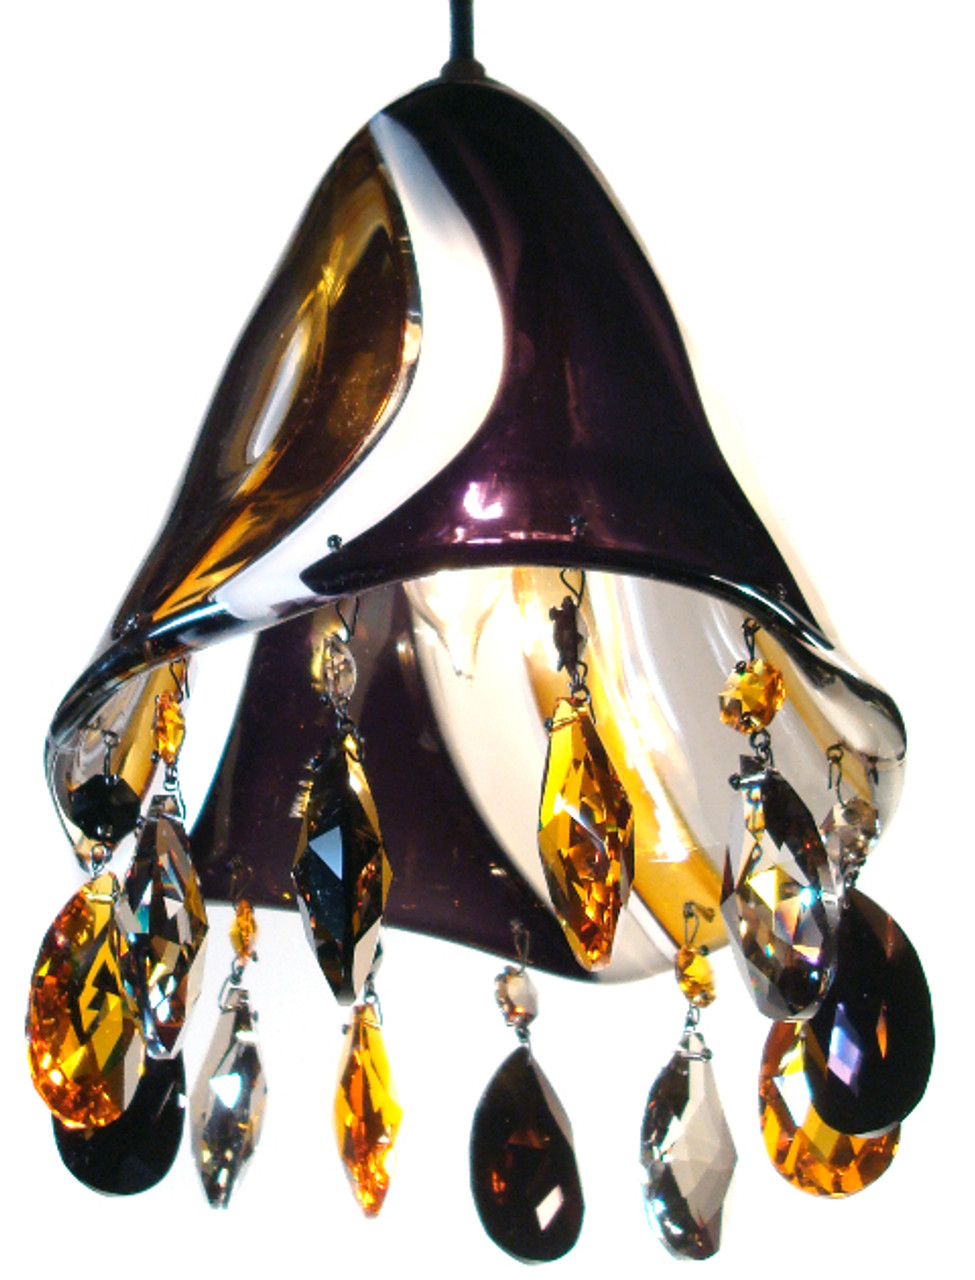 Hand Blown Glass Pendant Lights Art Glass And Strass Swarovski Crystal Nyc Lighting Designer Karen Curtis